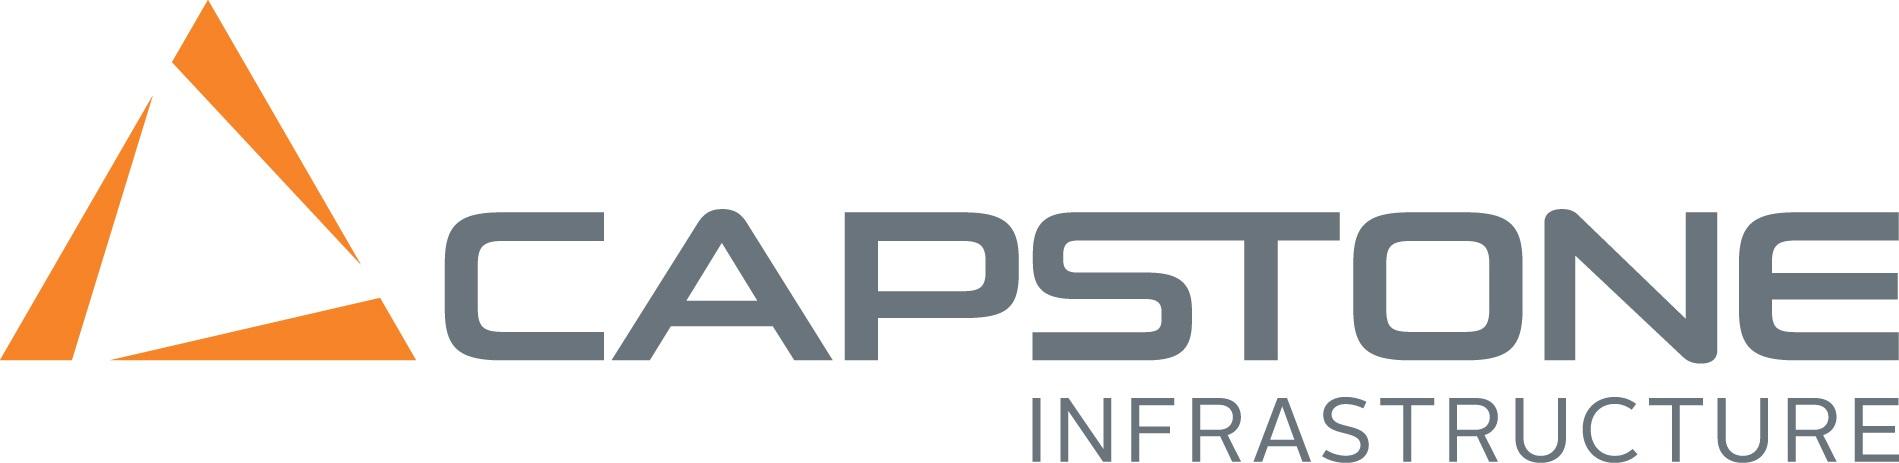 Capstone Infrastructure Corporation Announces Claresholm Solar Project Financing